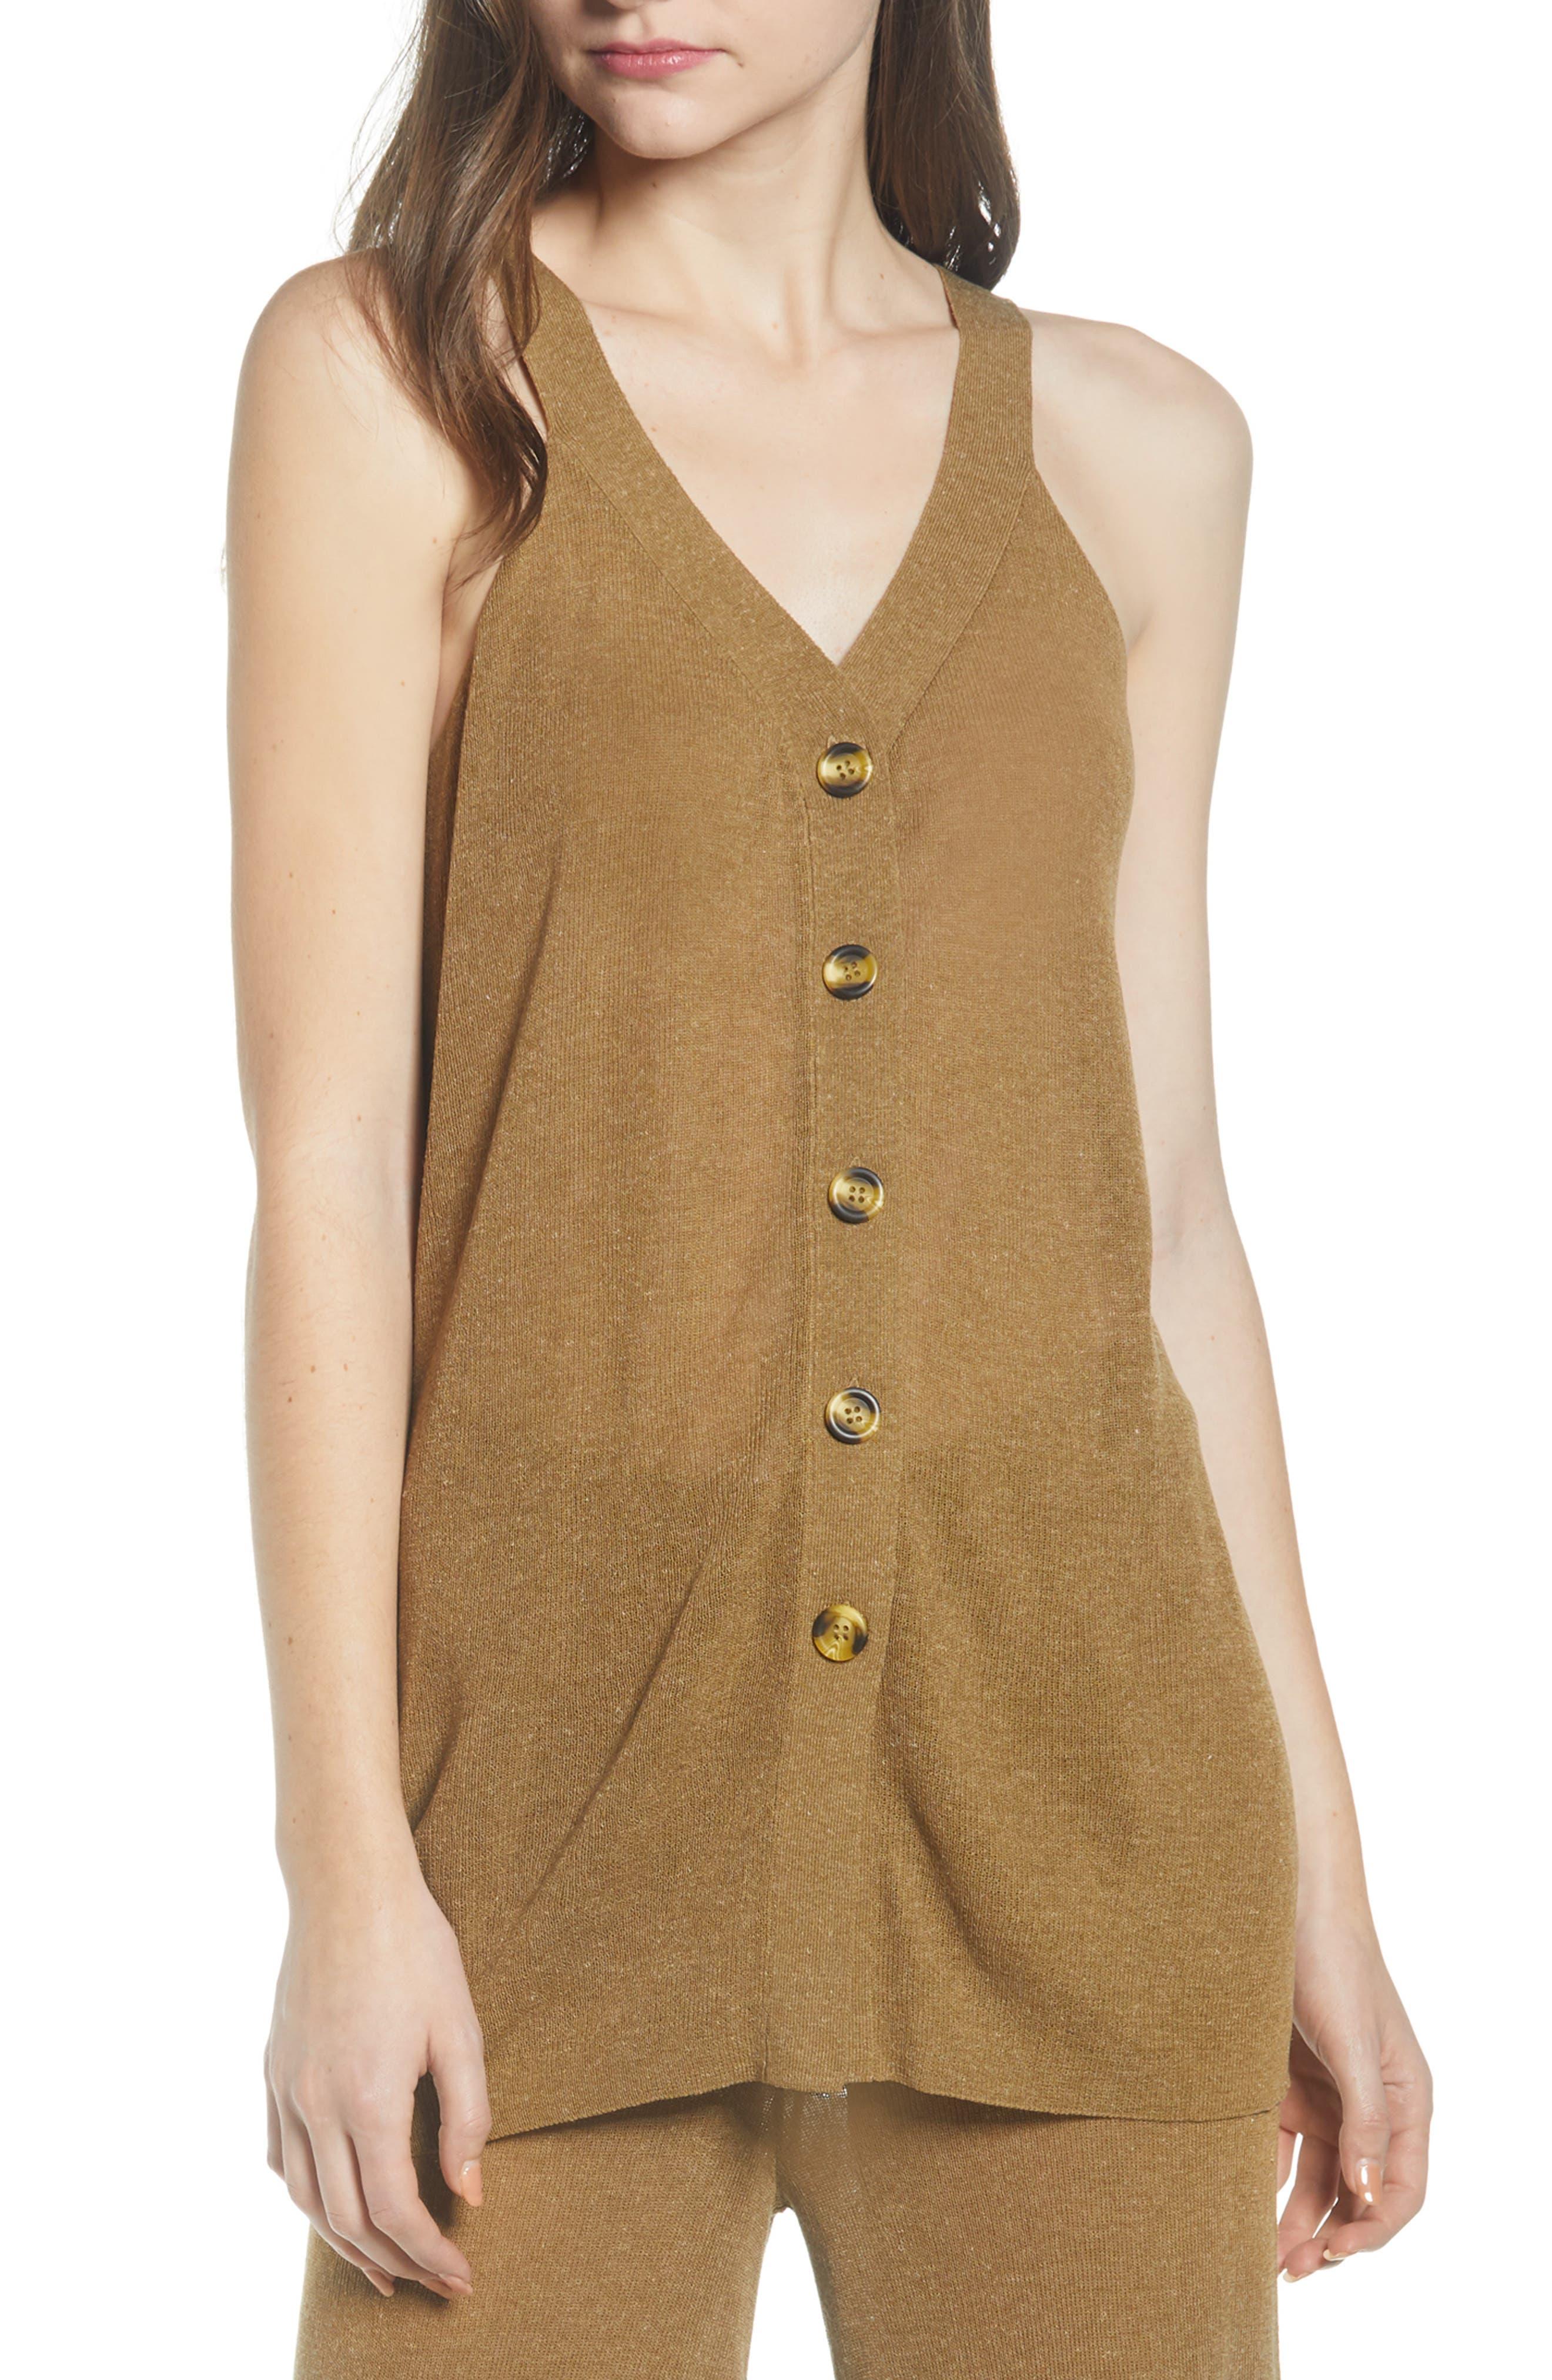 Noisy May Soren Sweater Tank Top, Green